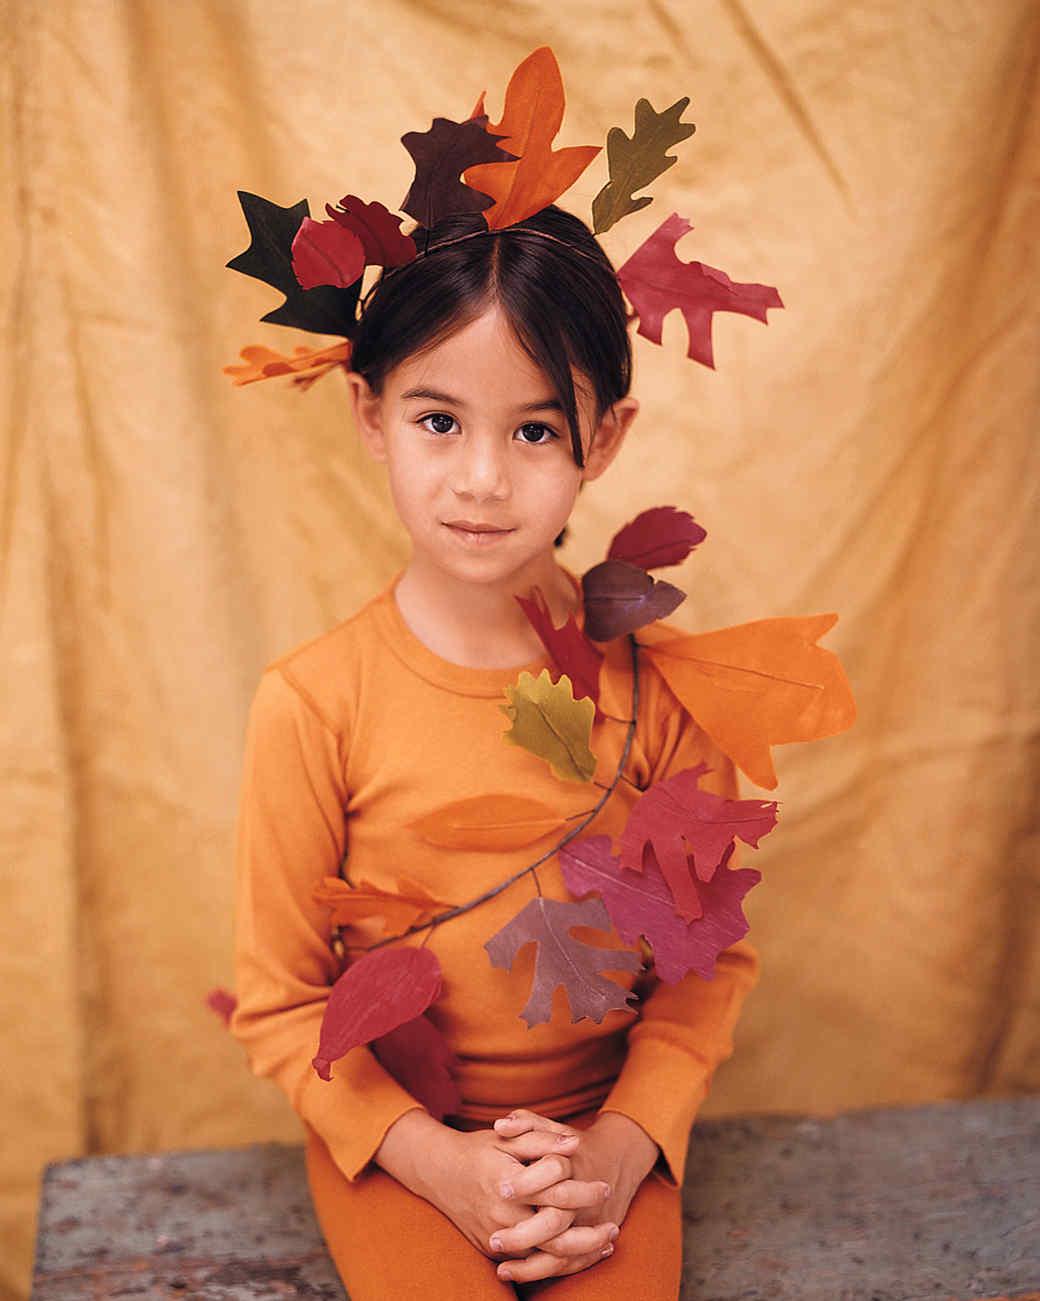 Homemade Kids' Halloween Costumes Martha Stewart